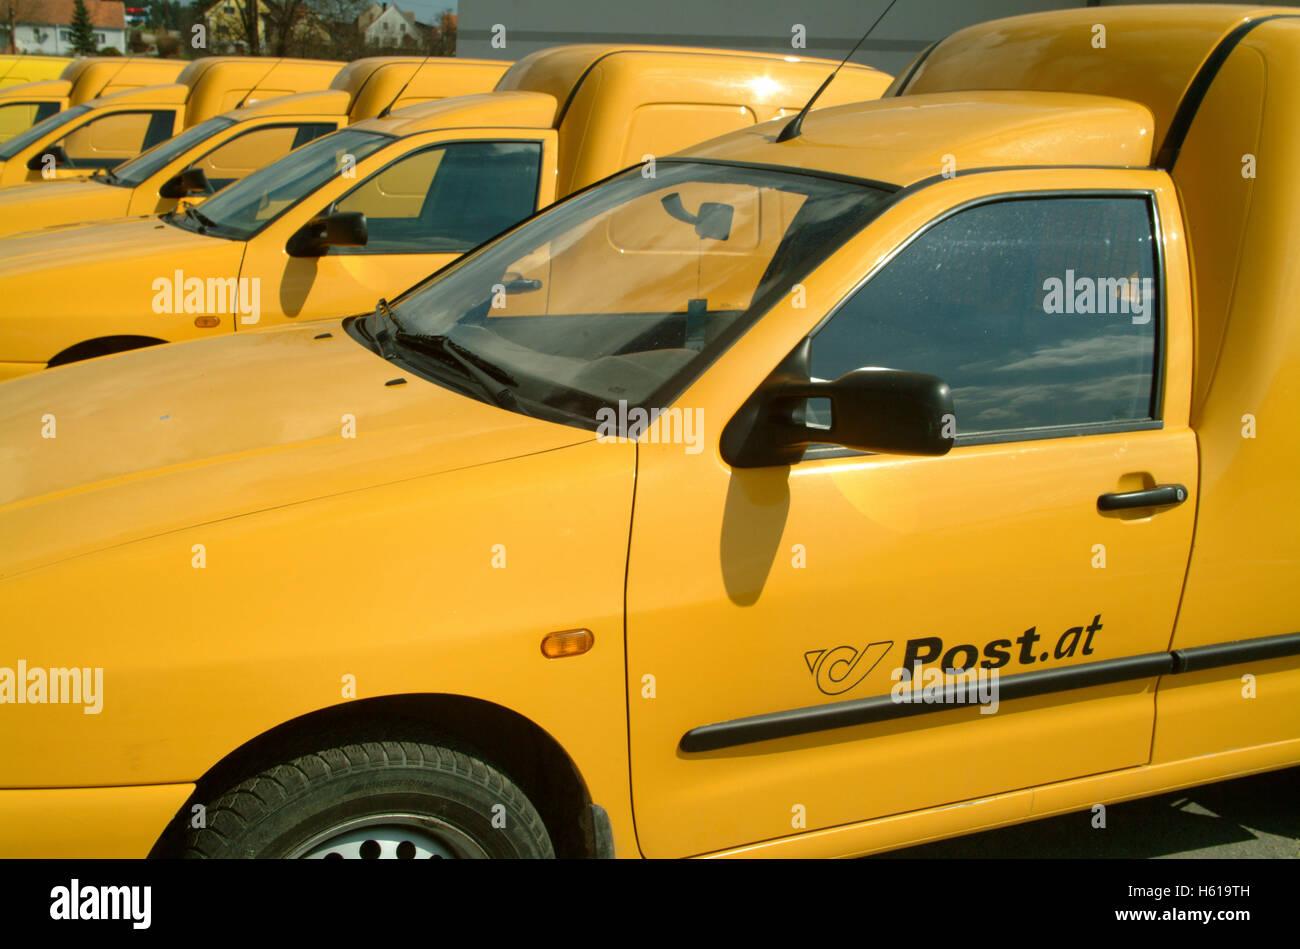 Post car Stock Photo